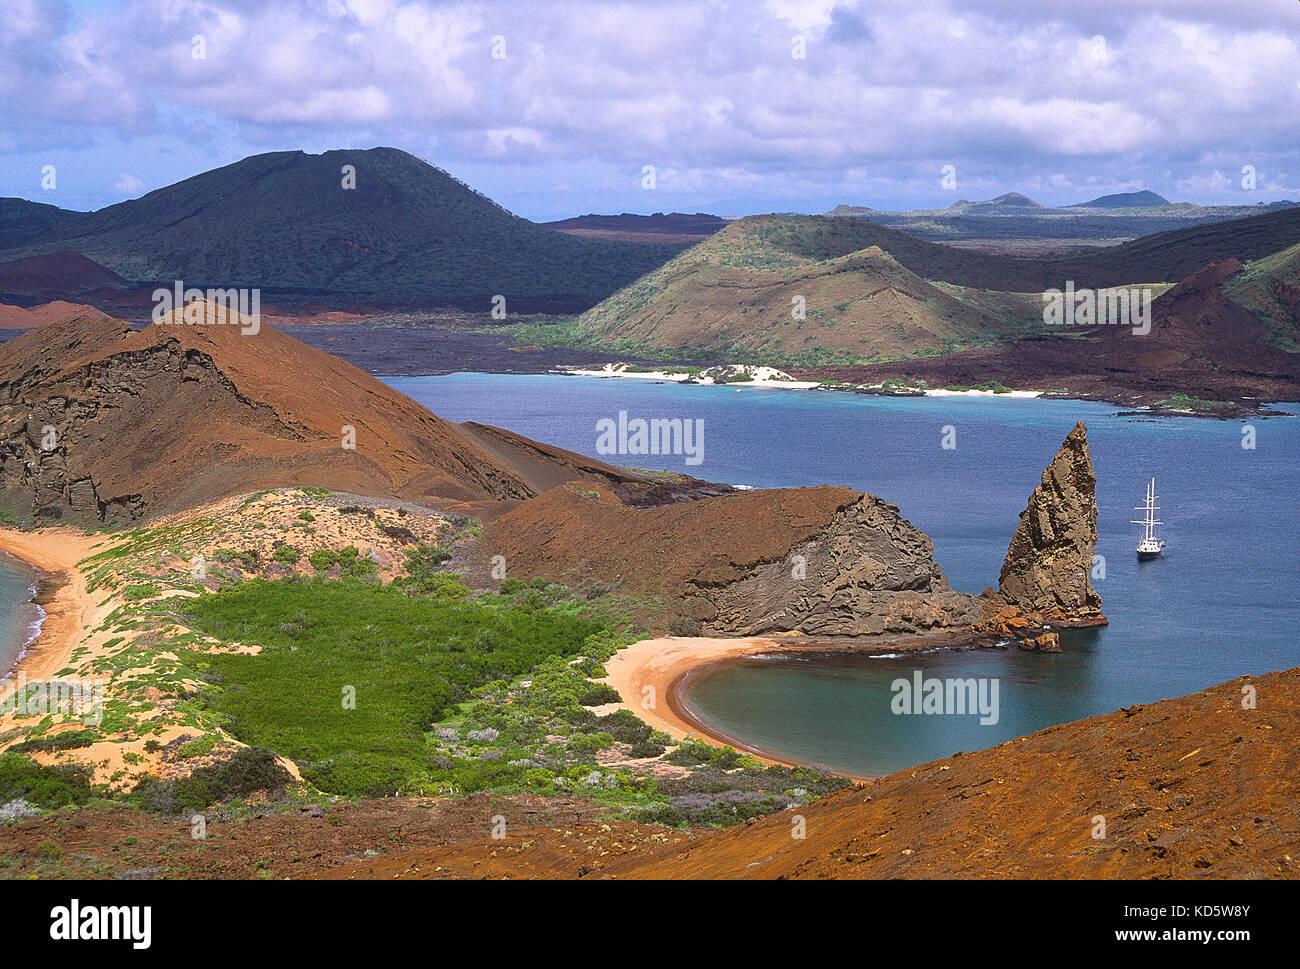 Galapagos Islands.Bartolomé Island, High viewpoint of coastal bays and Pinnacle Rock. - Stock Image